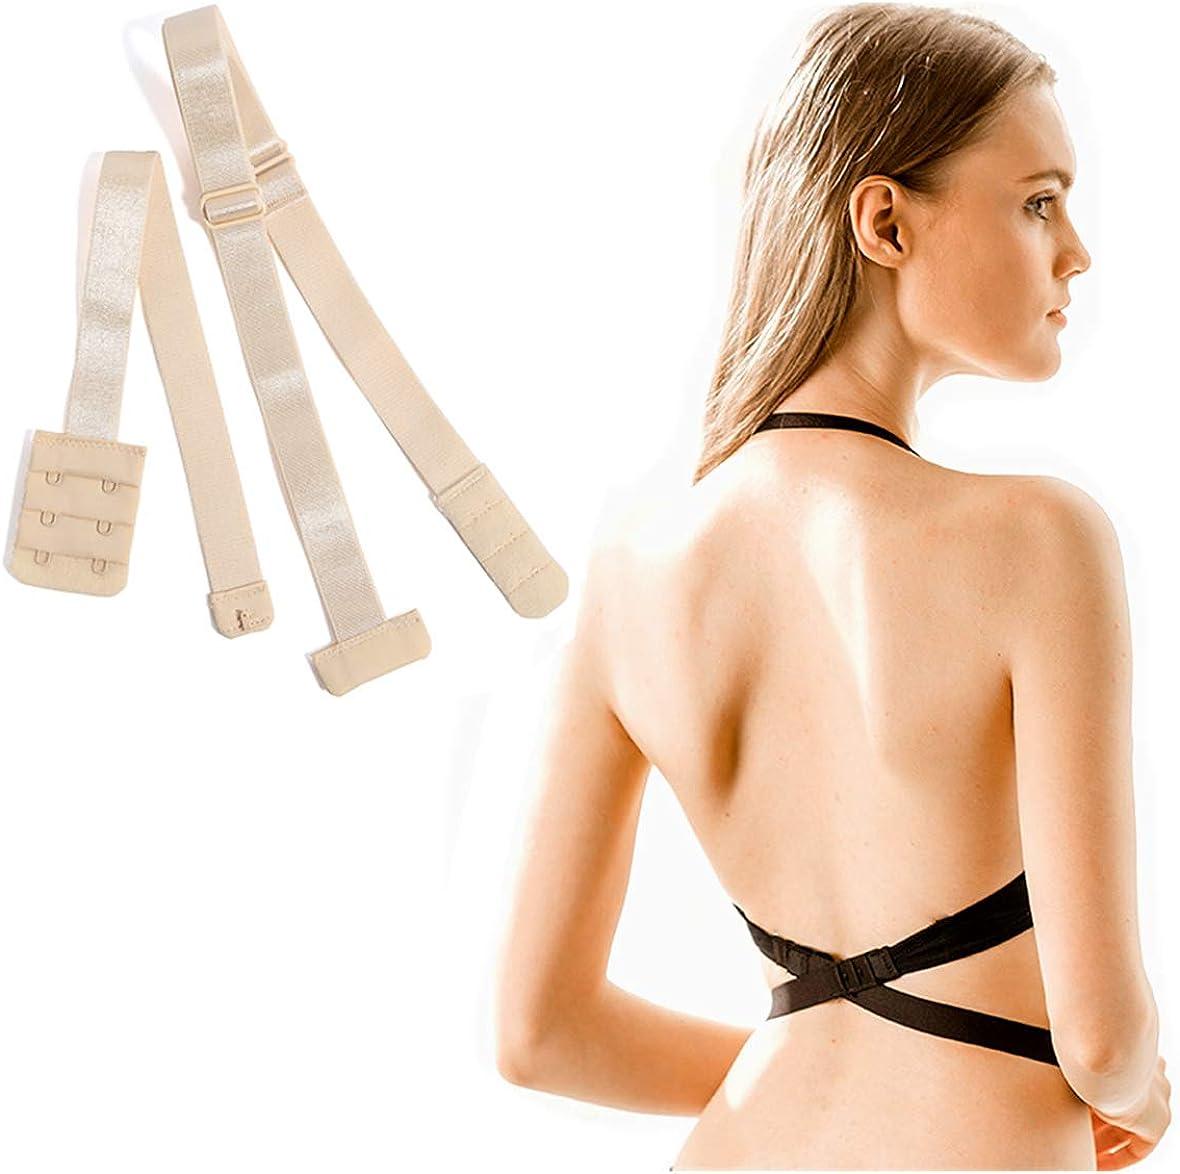 WHITE Adjust Your Bra Backless Alterback Low Back Bra Strap Converter